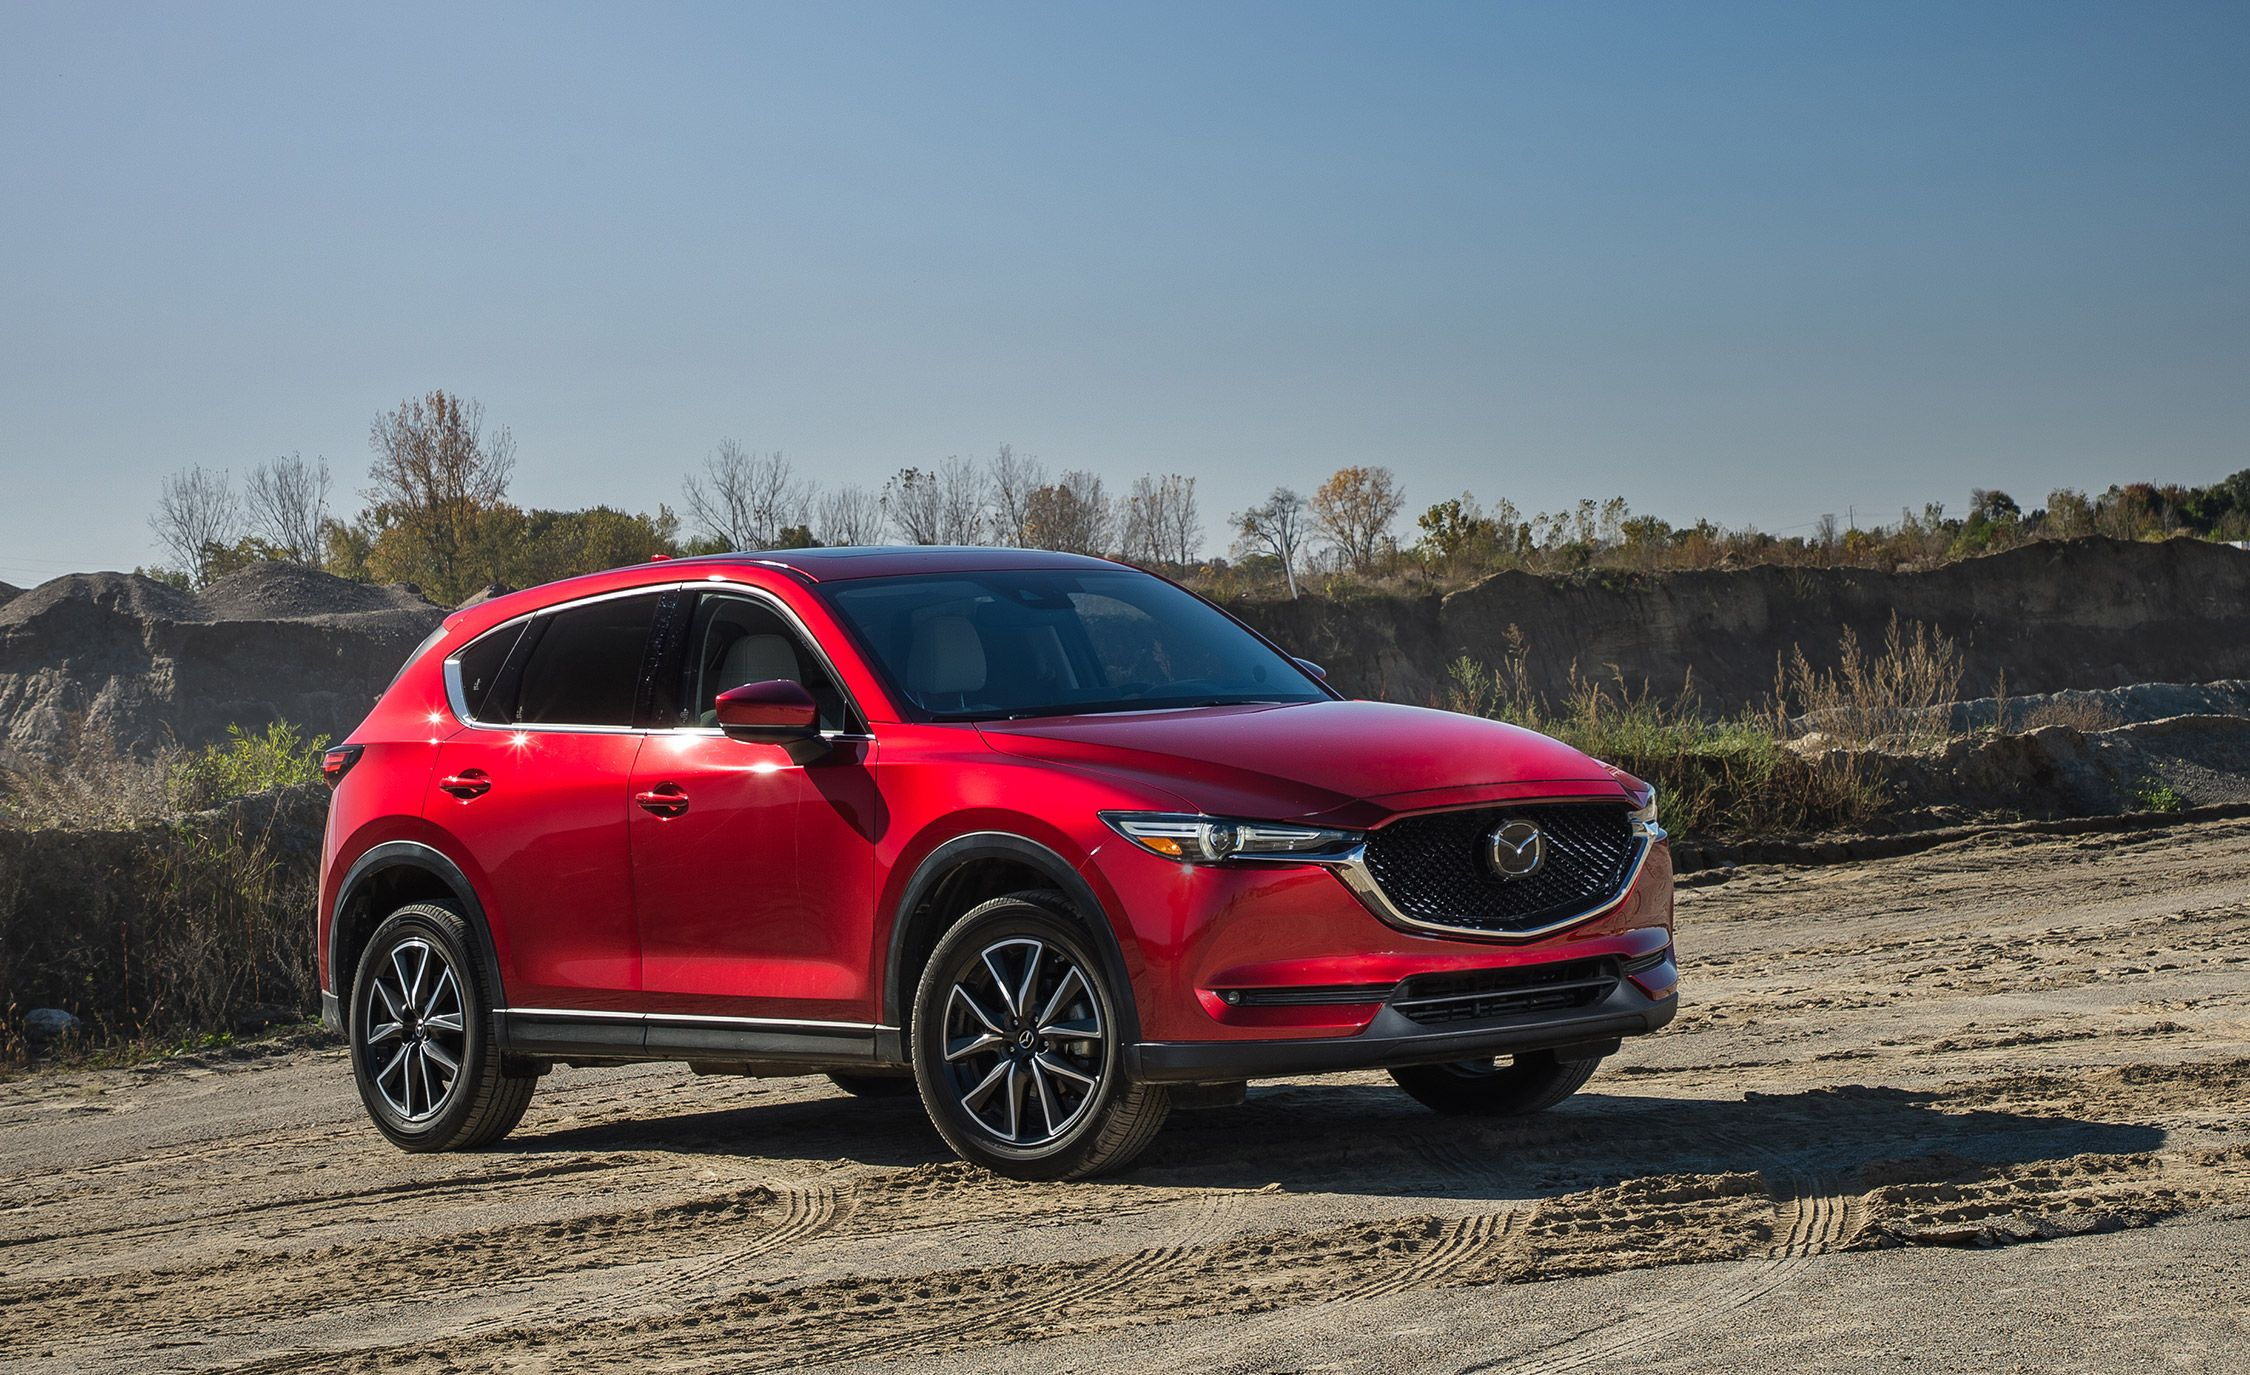 Mazda CX-5: Best Compact SUV